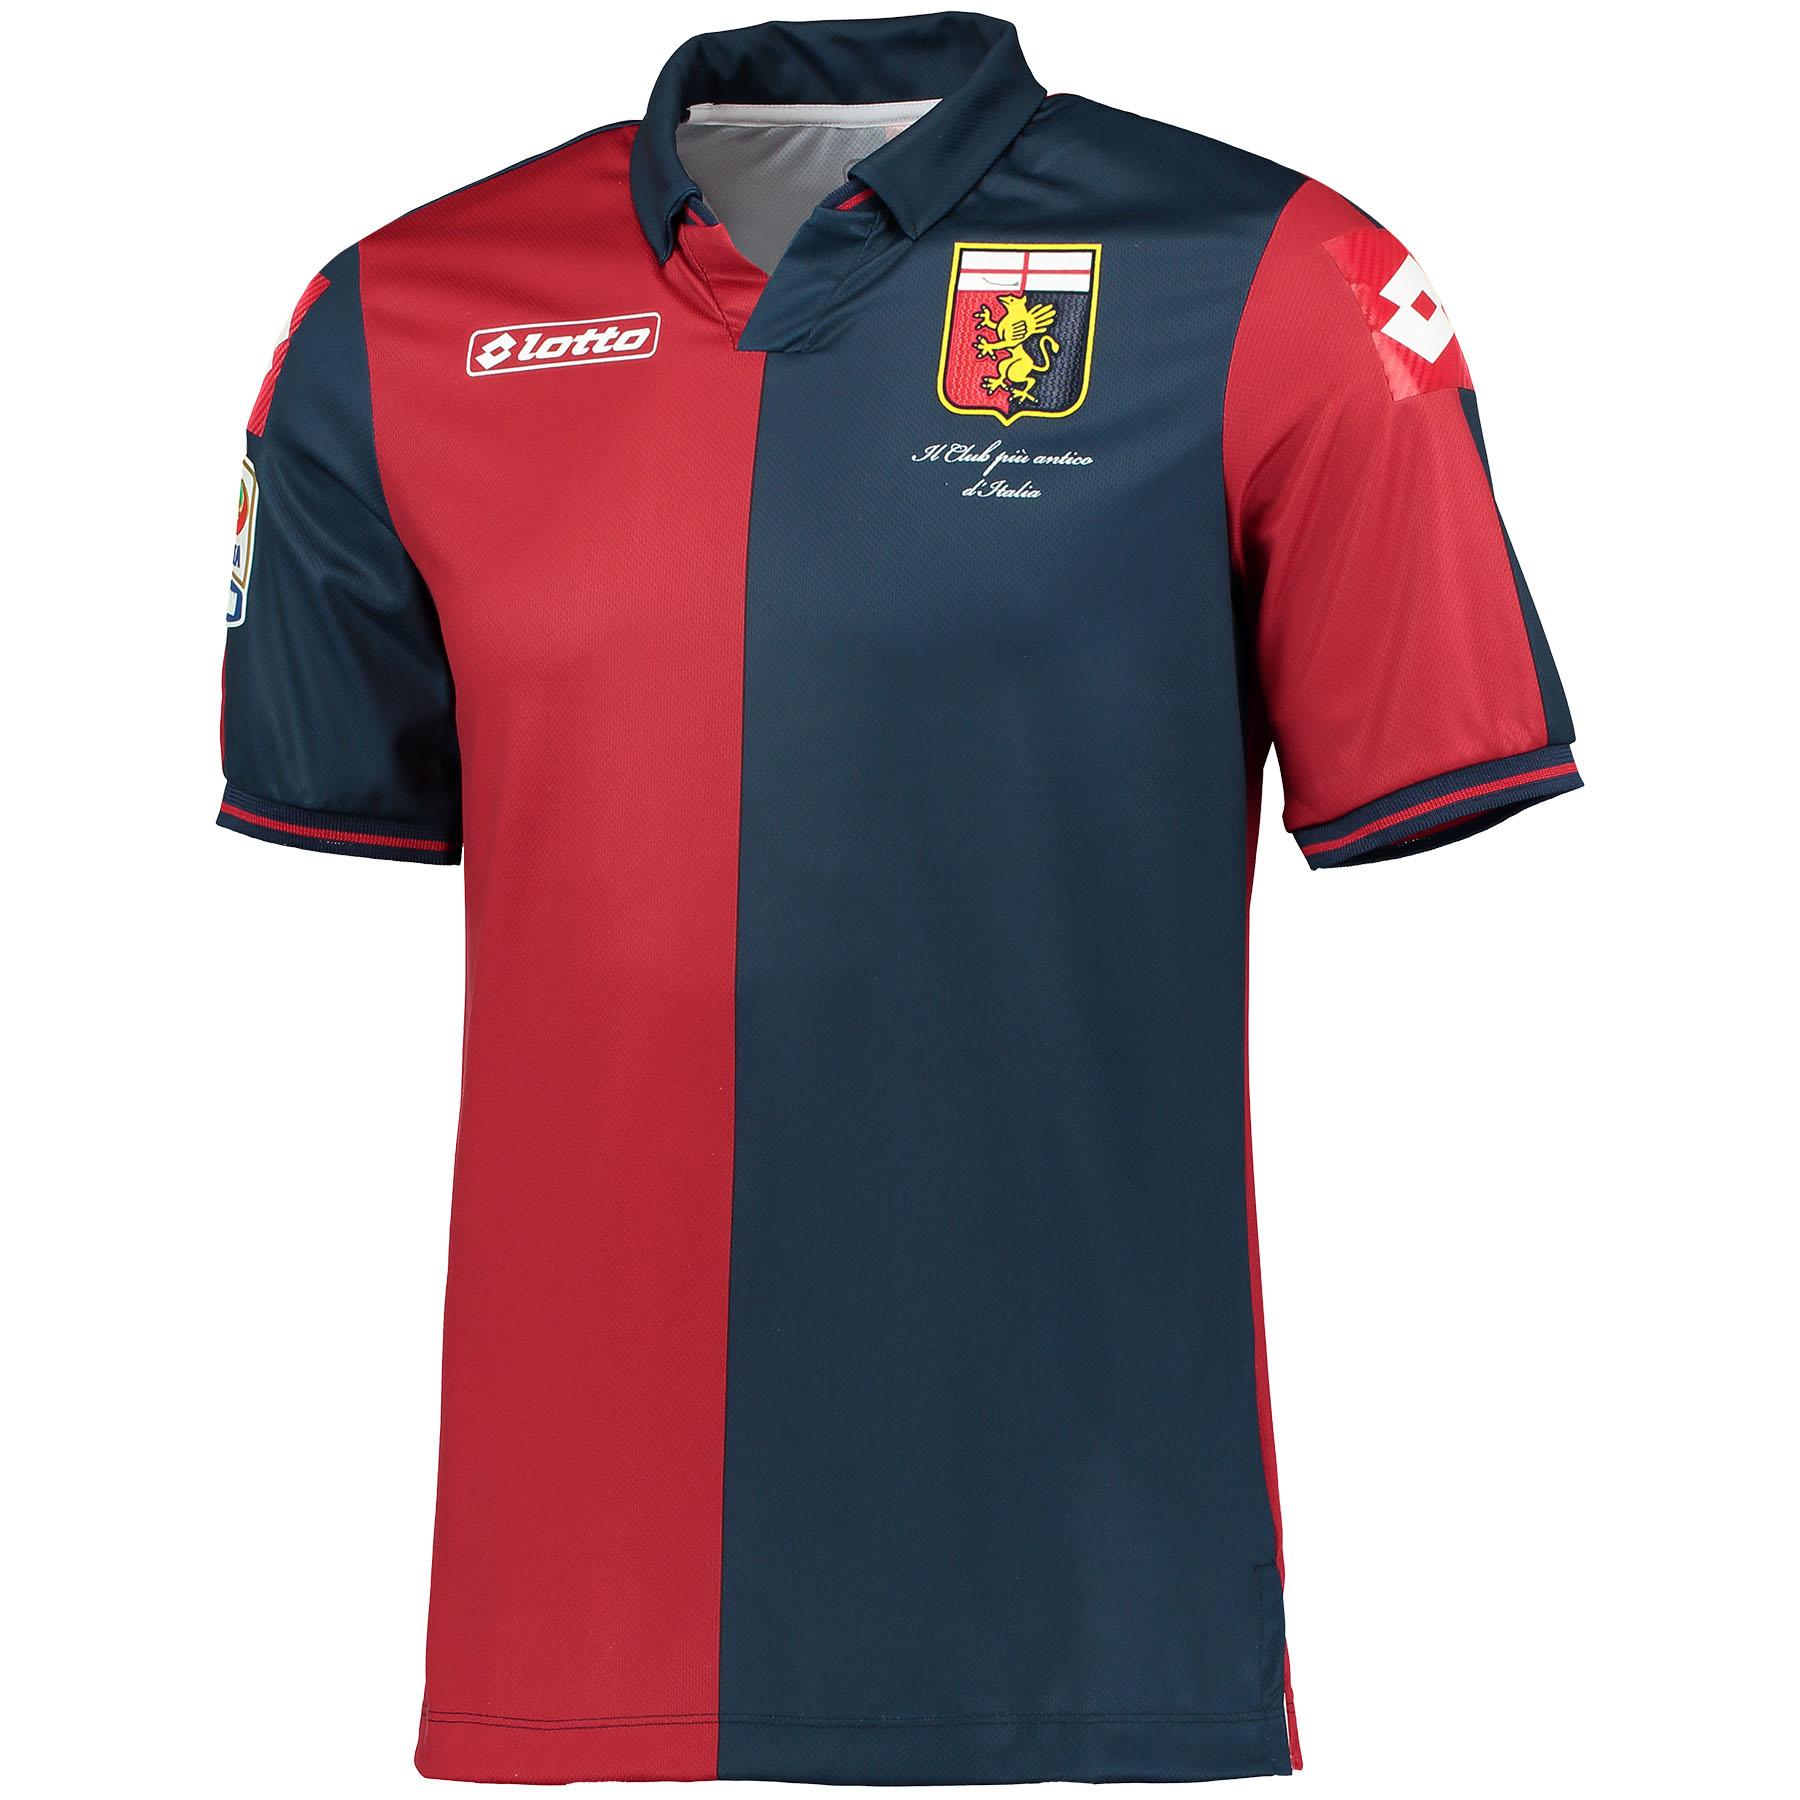 Genoa Home Shirt 2014/15 Red